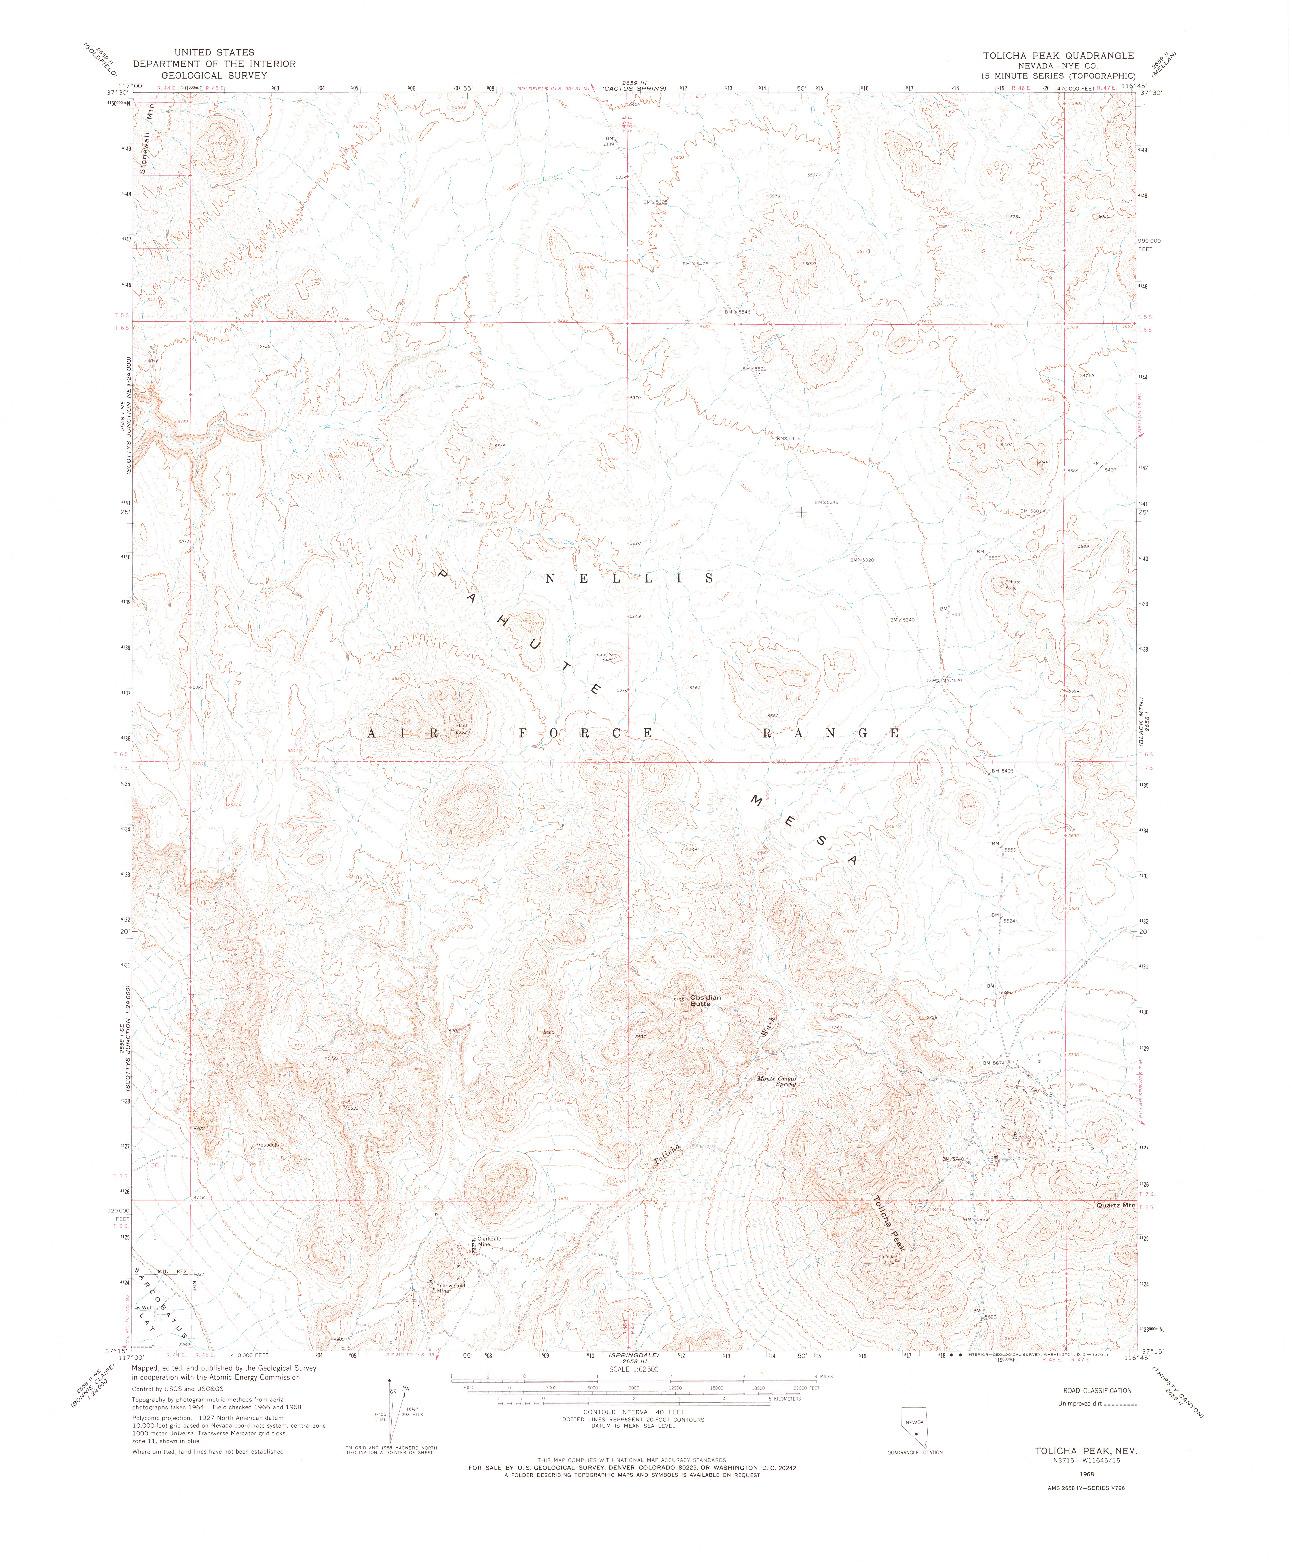 USGS 1:62500-SCALE QUADRANGLE FOR TOLICHA PEAK, NV 1968